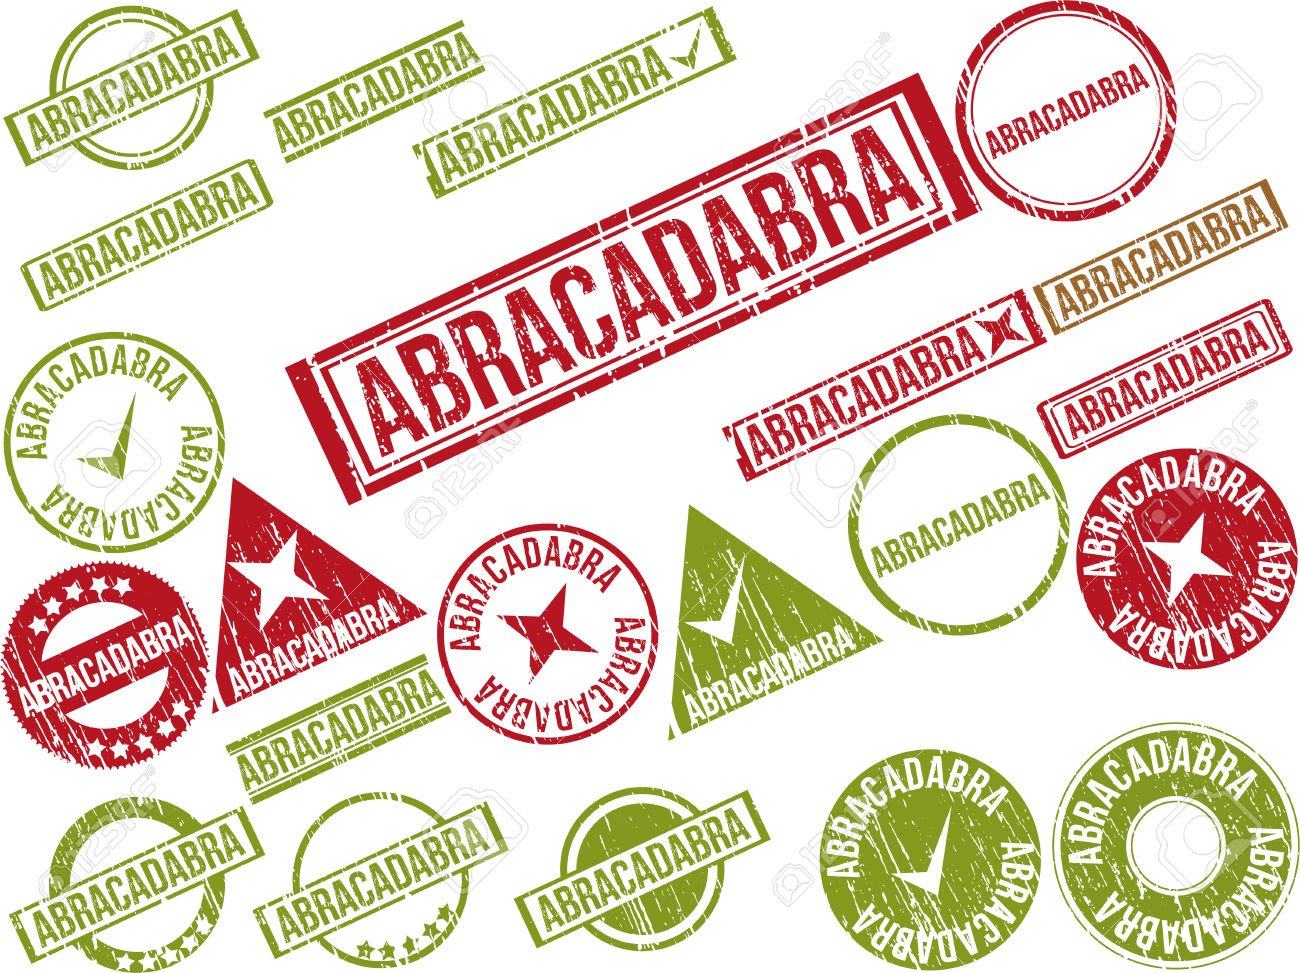 ABRACADABRA: CREO CIO' CHE DICO!